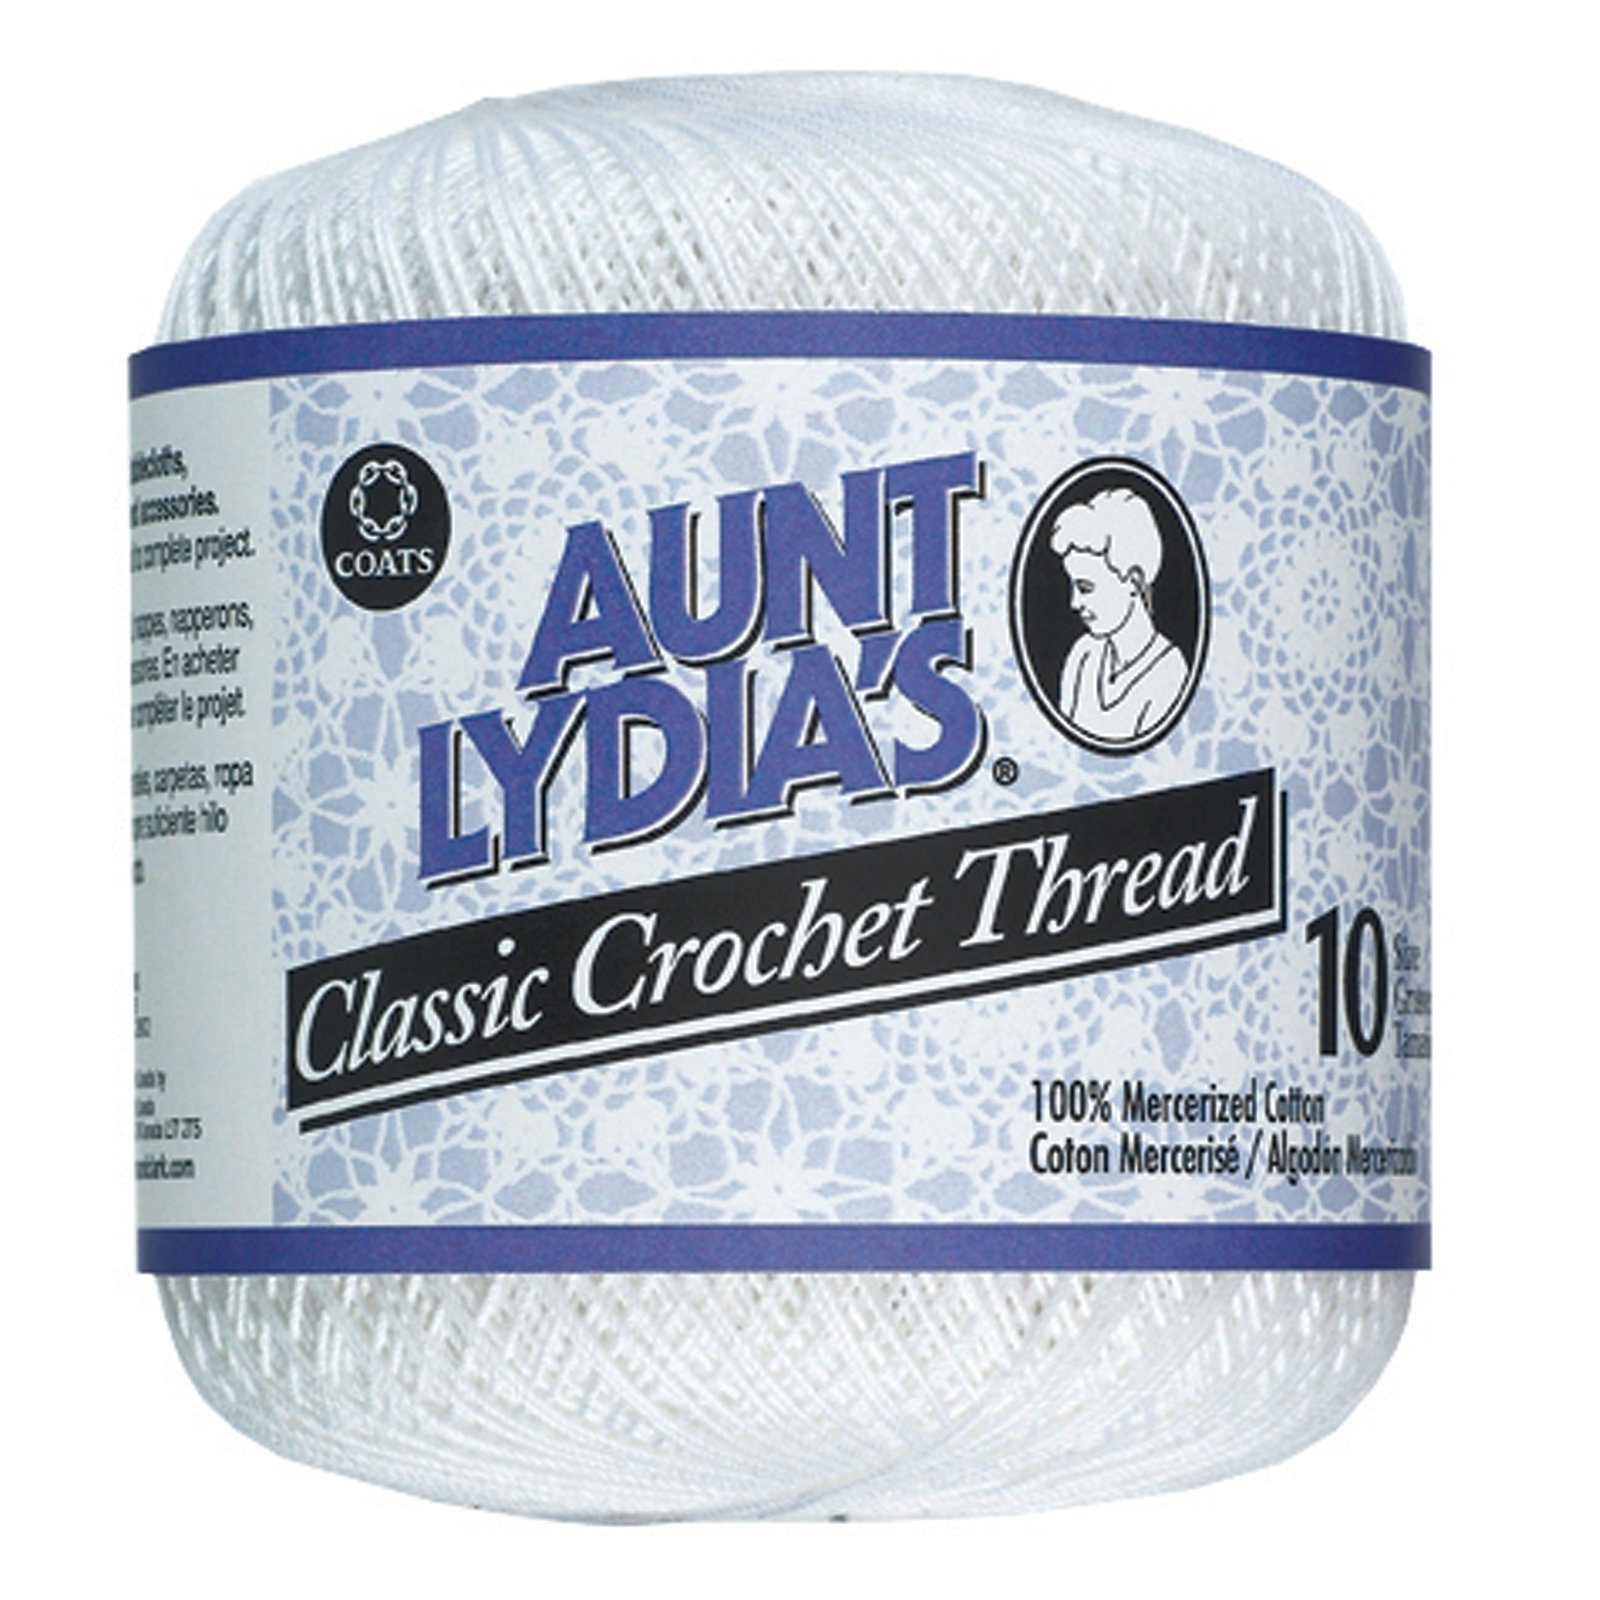 Aunt Lydia'S Classic Crochet Thread, White, 400 Yds - 3 Pkgs